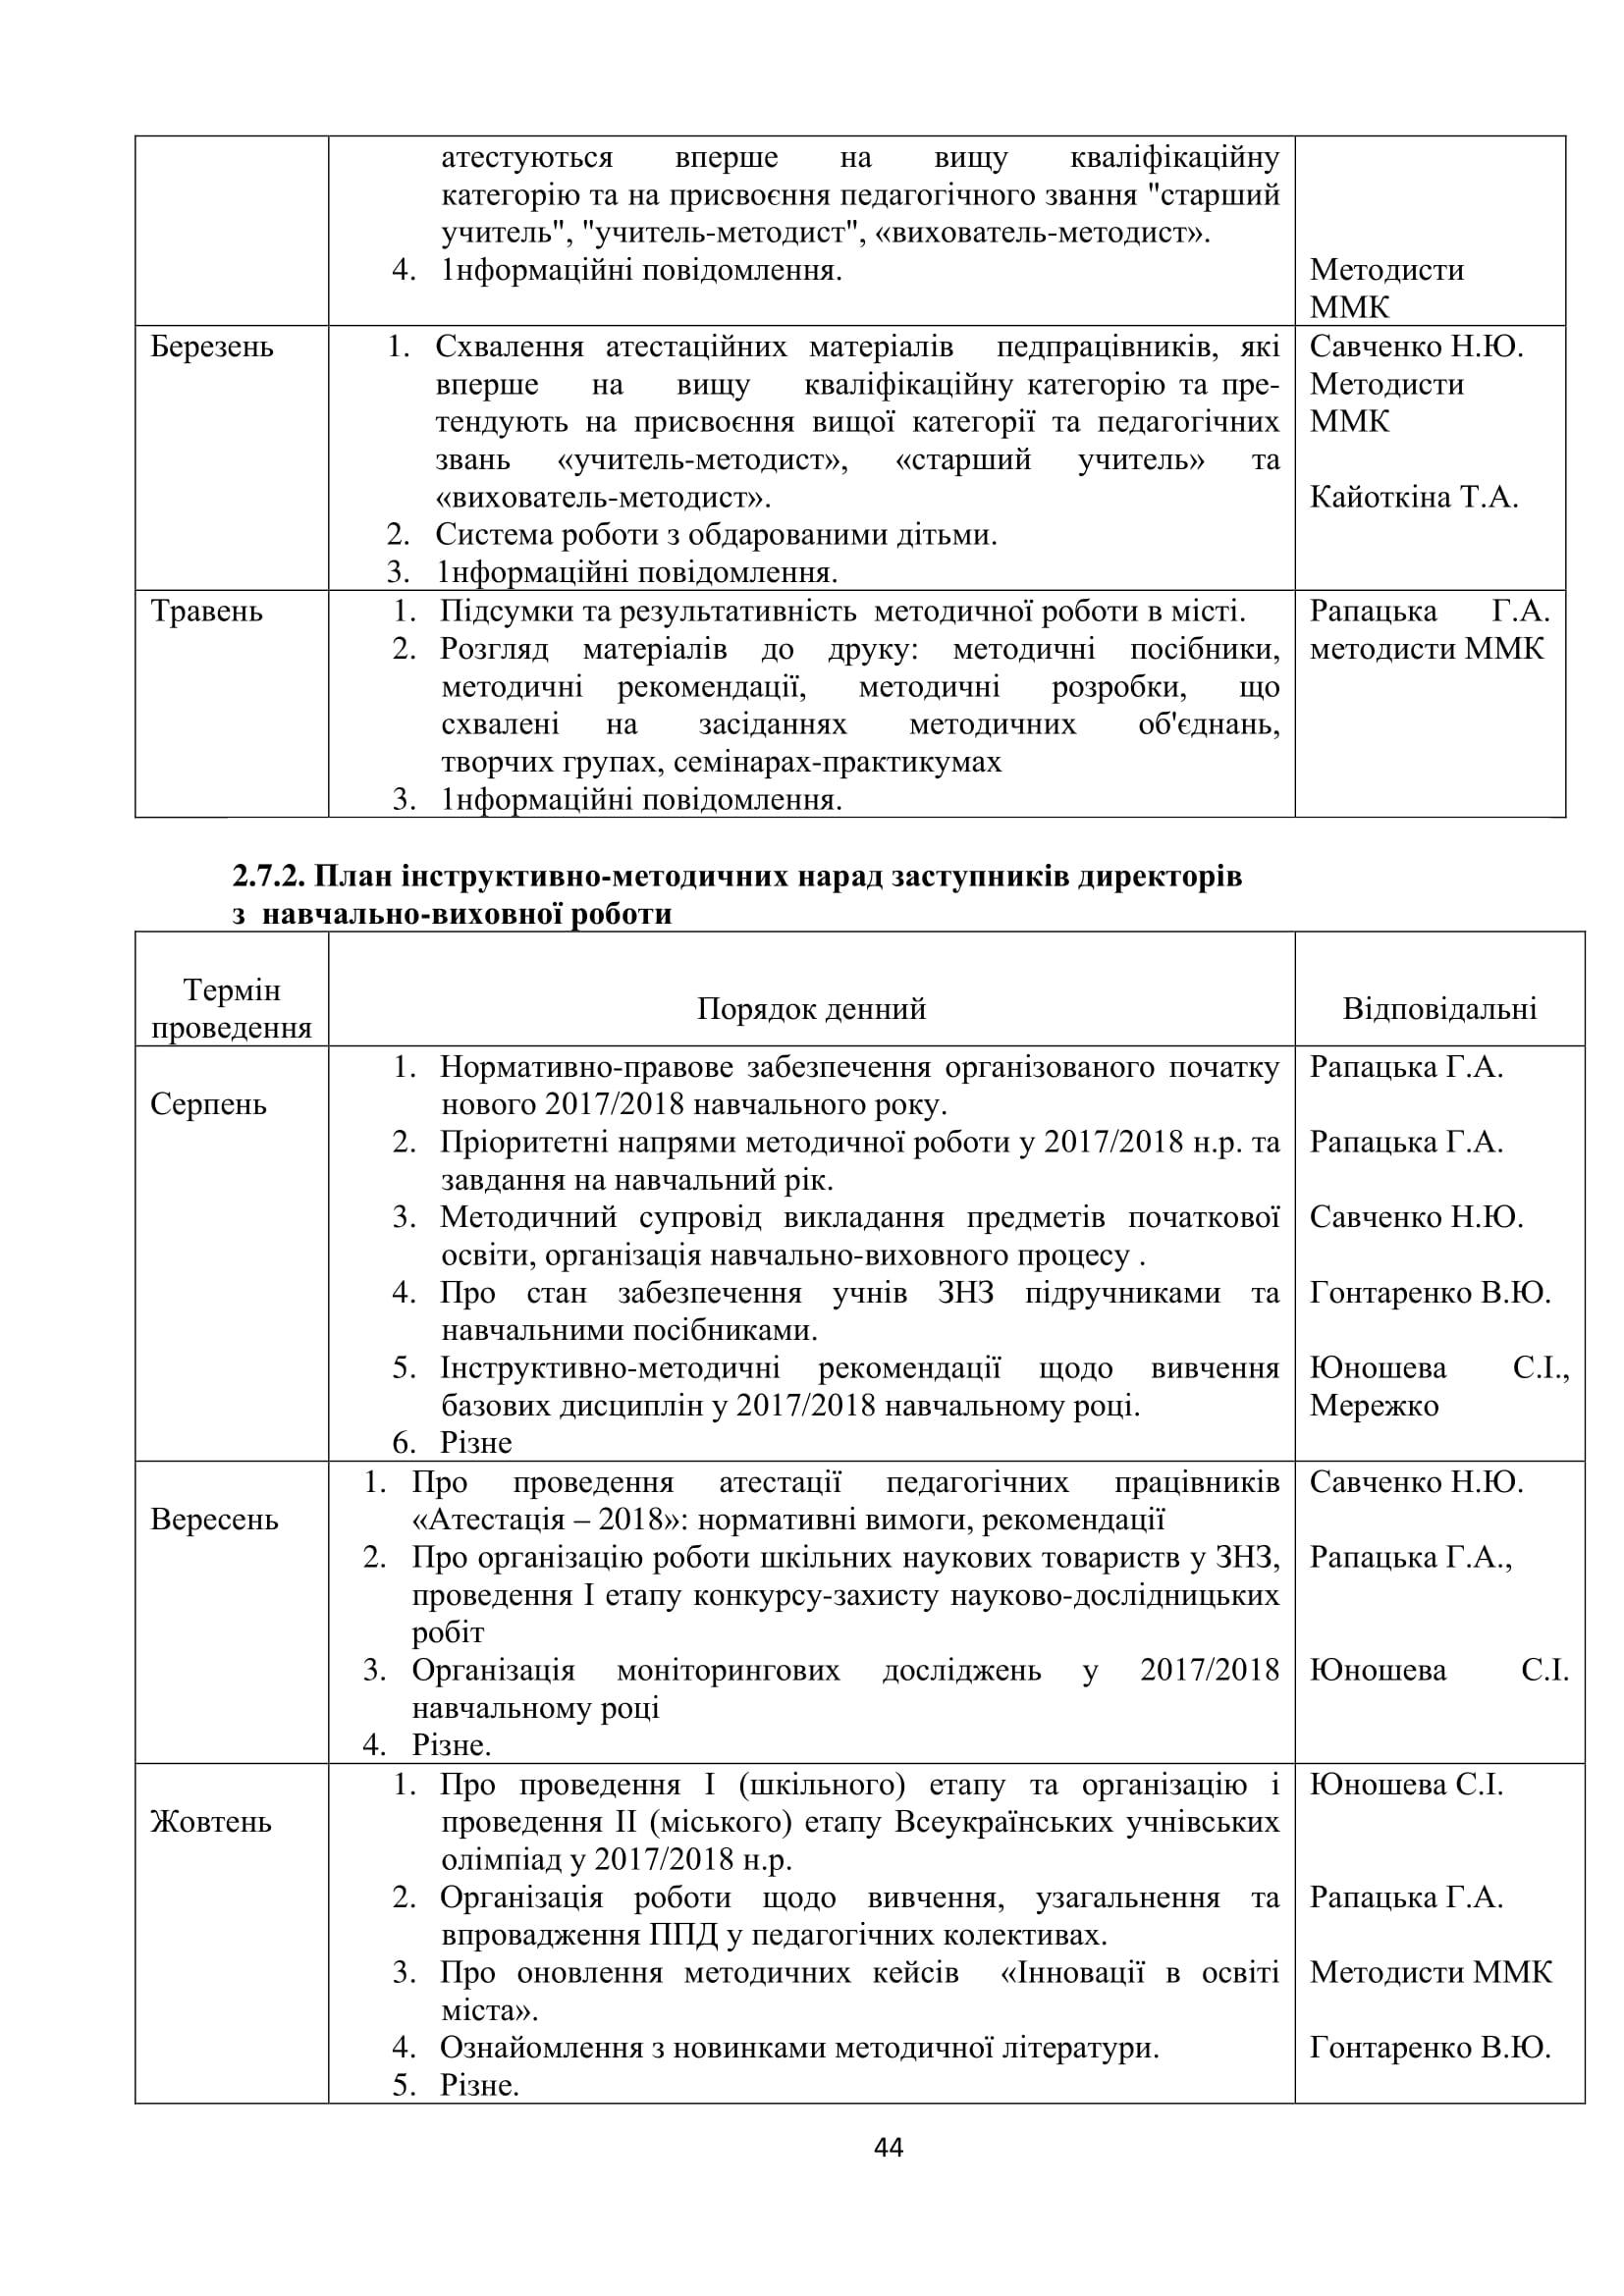 2017-2018 - ММК план роботи-45